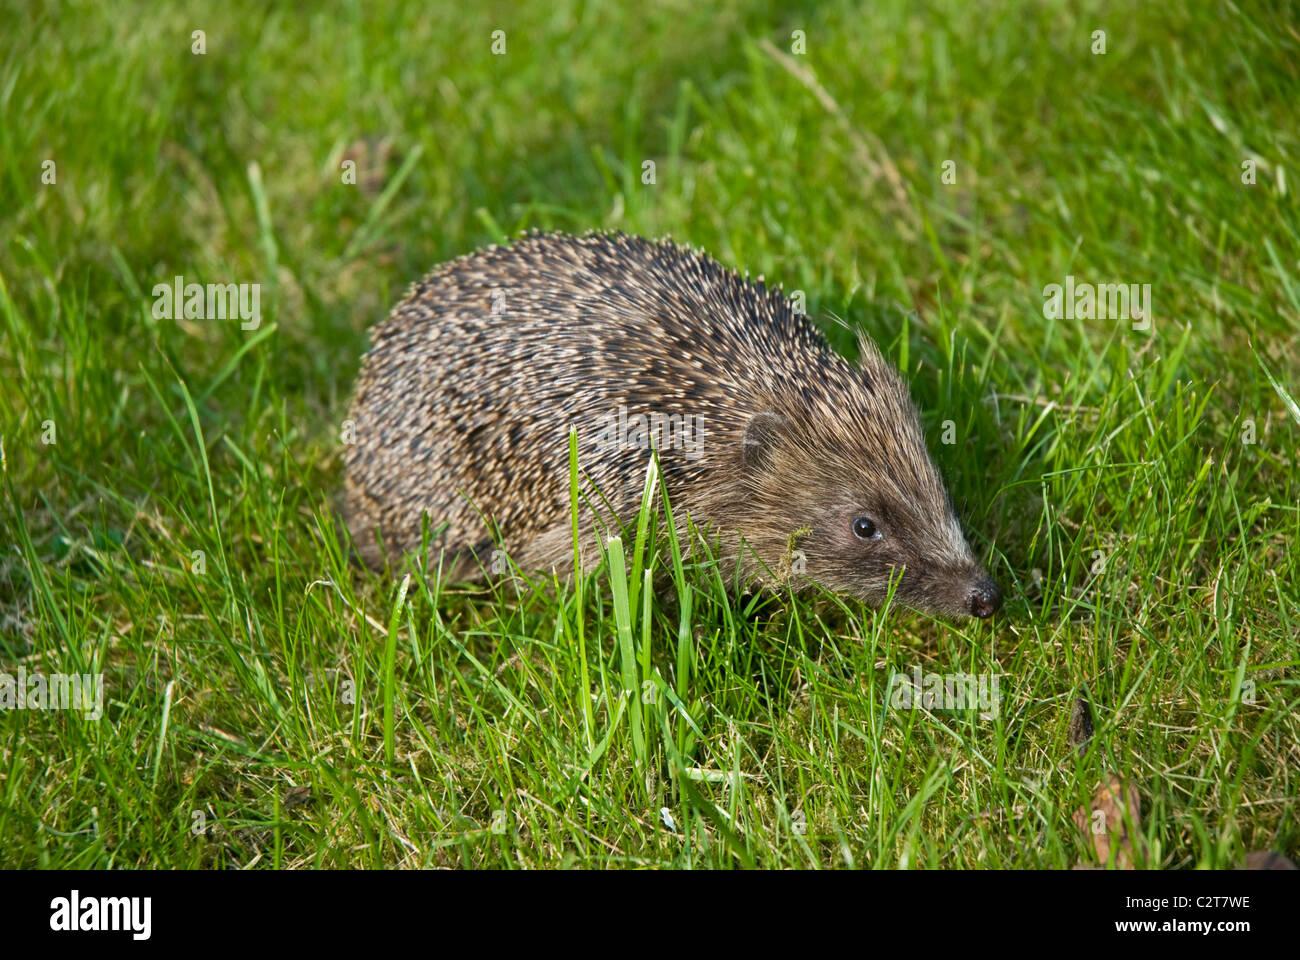 A hedgehog in an English garden - Stock Image